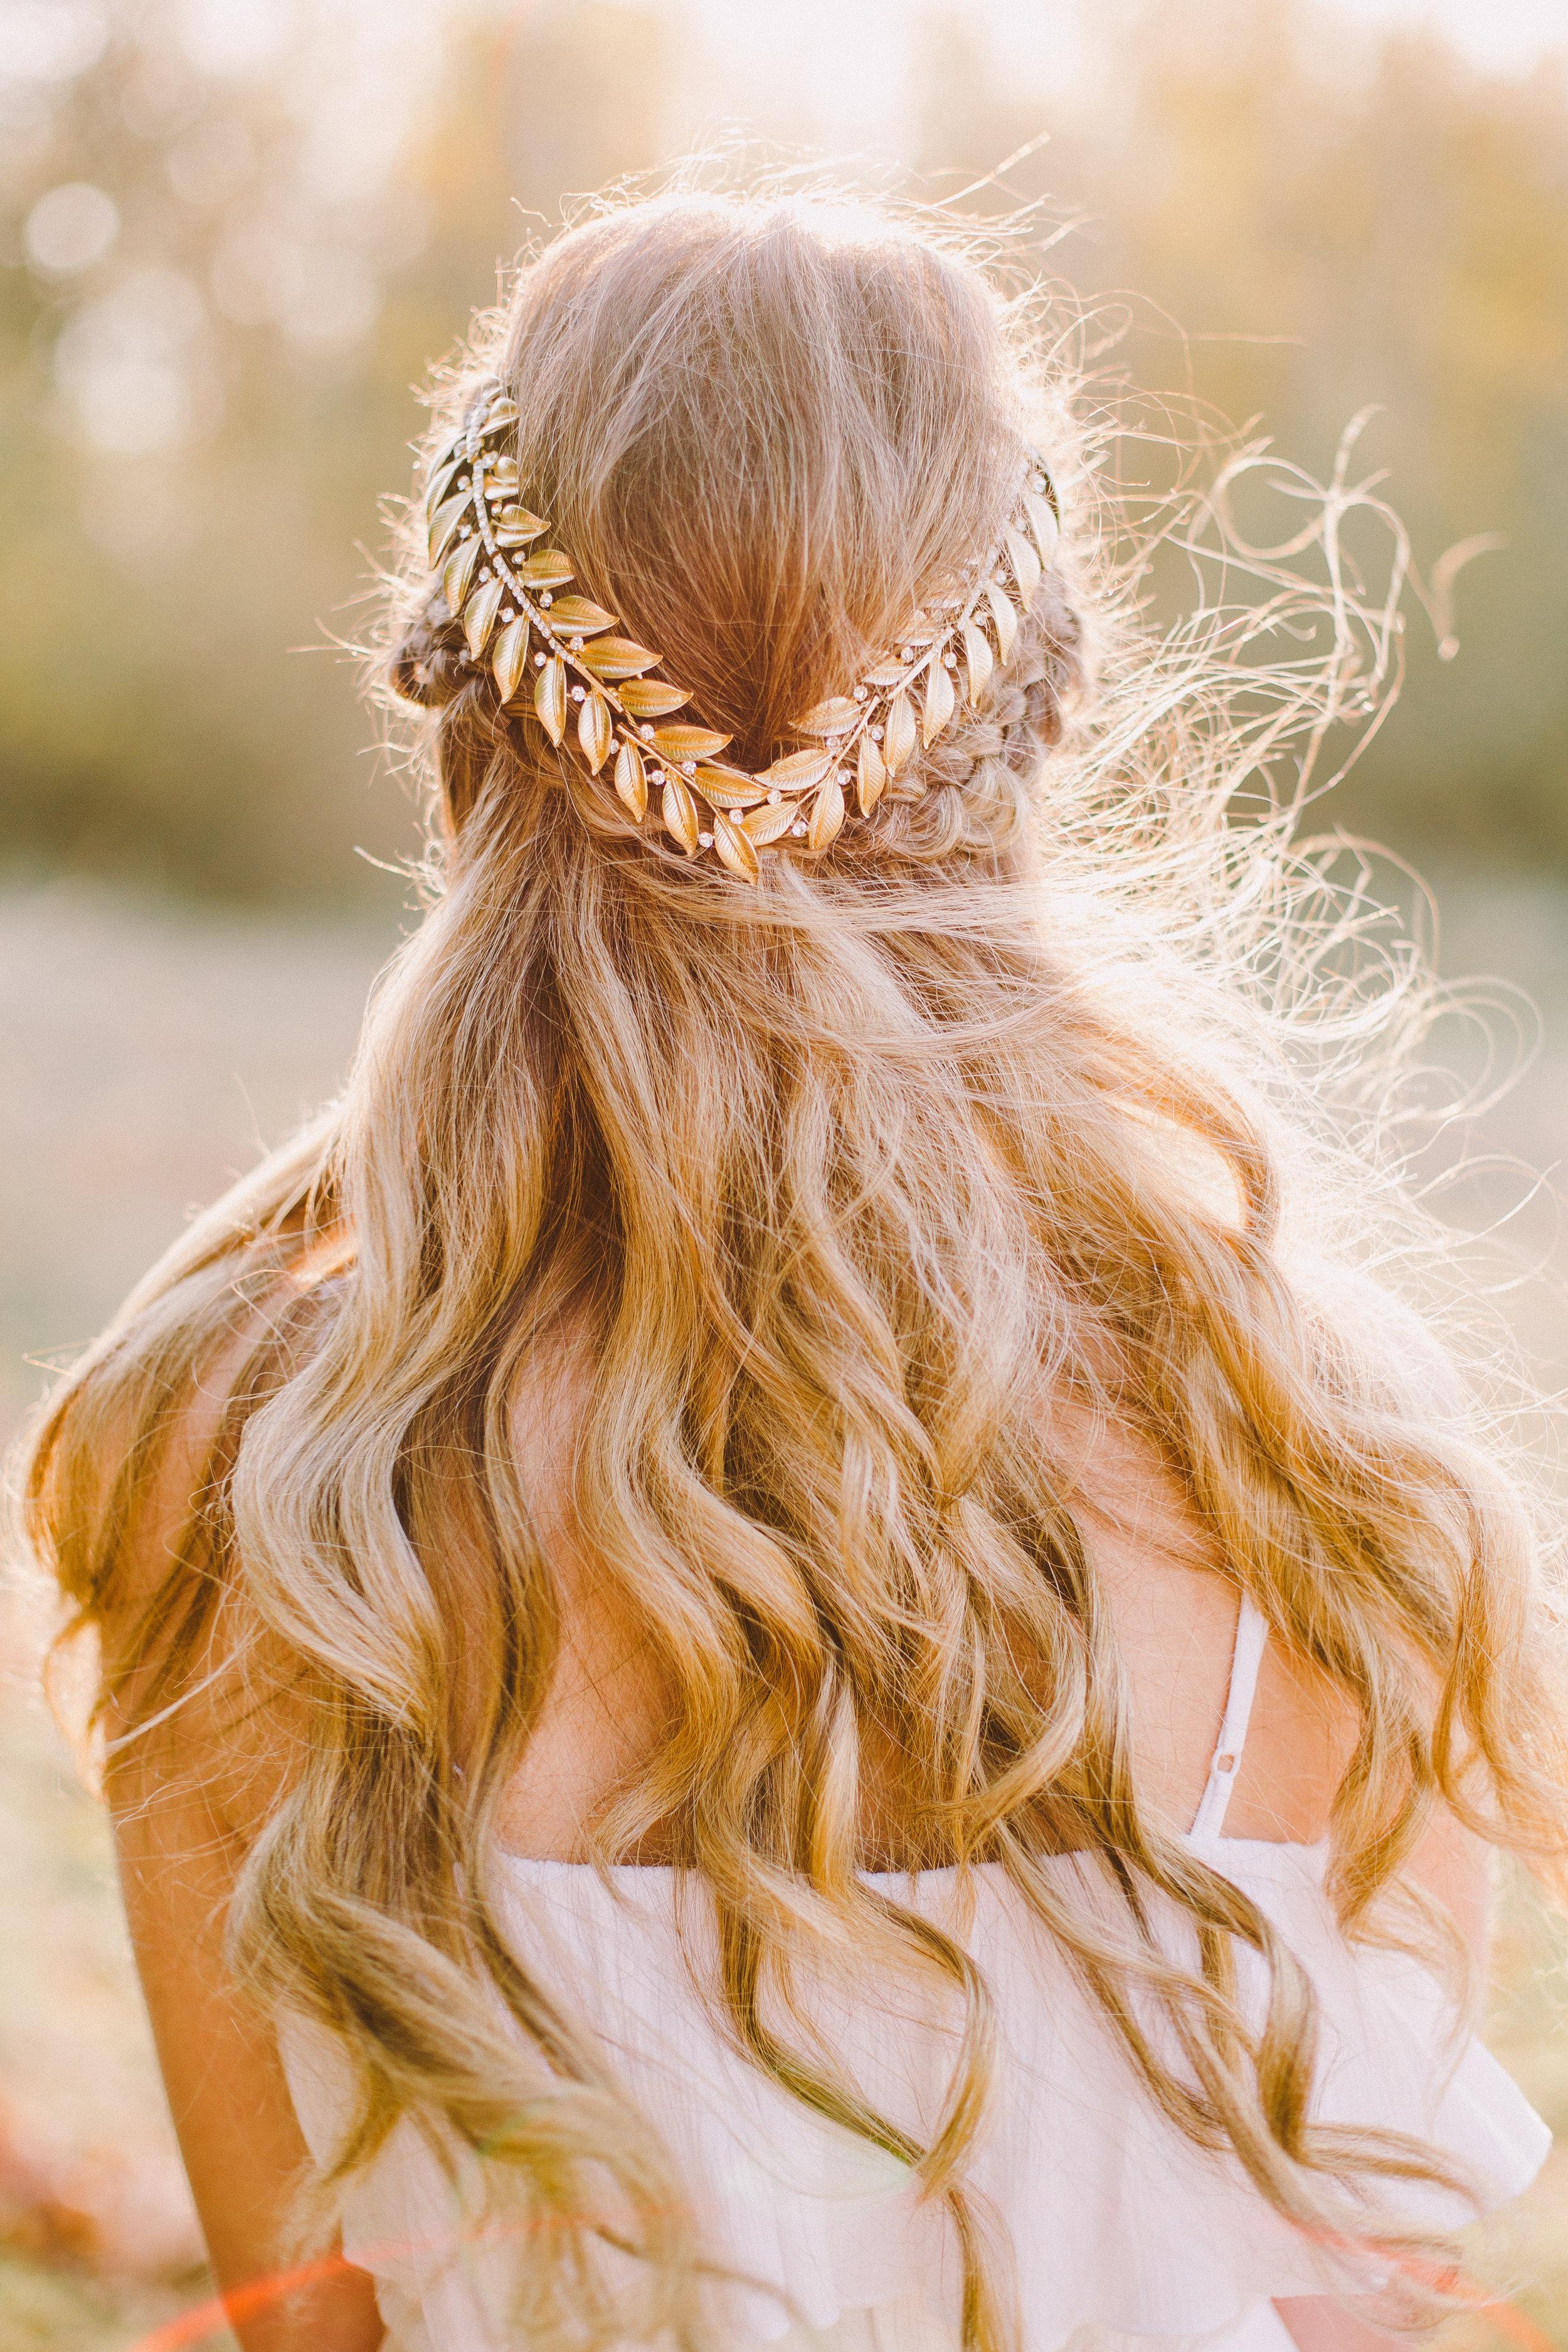 Bellingham bridal hair stylist, makeup artist, Barn Star Events